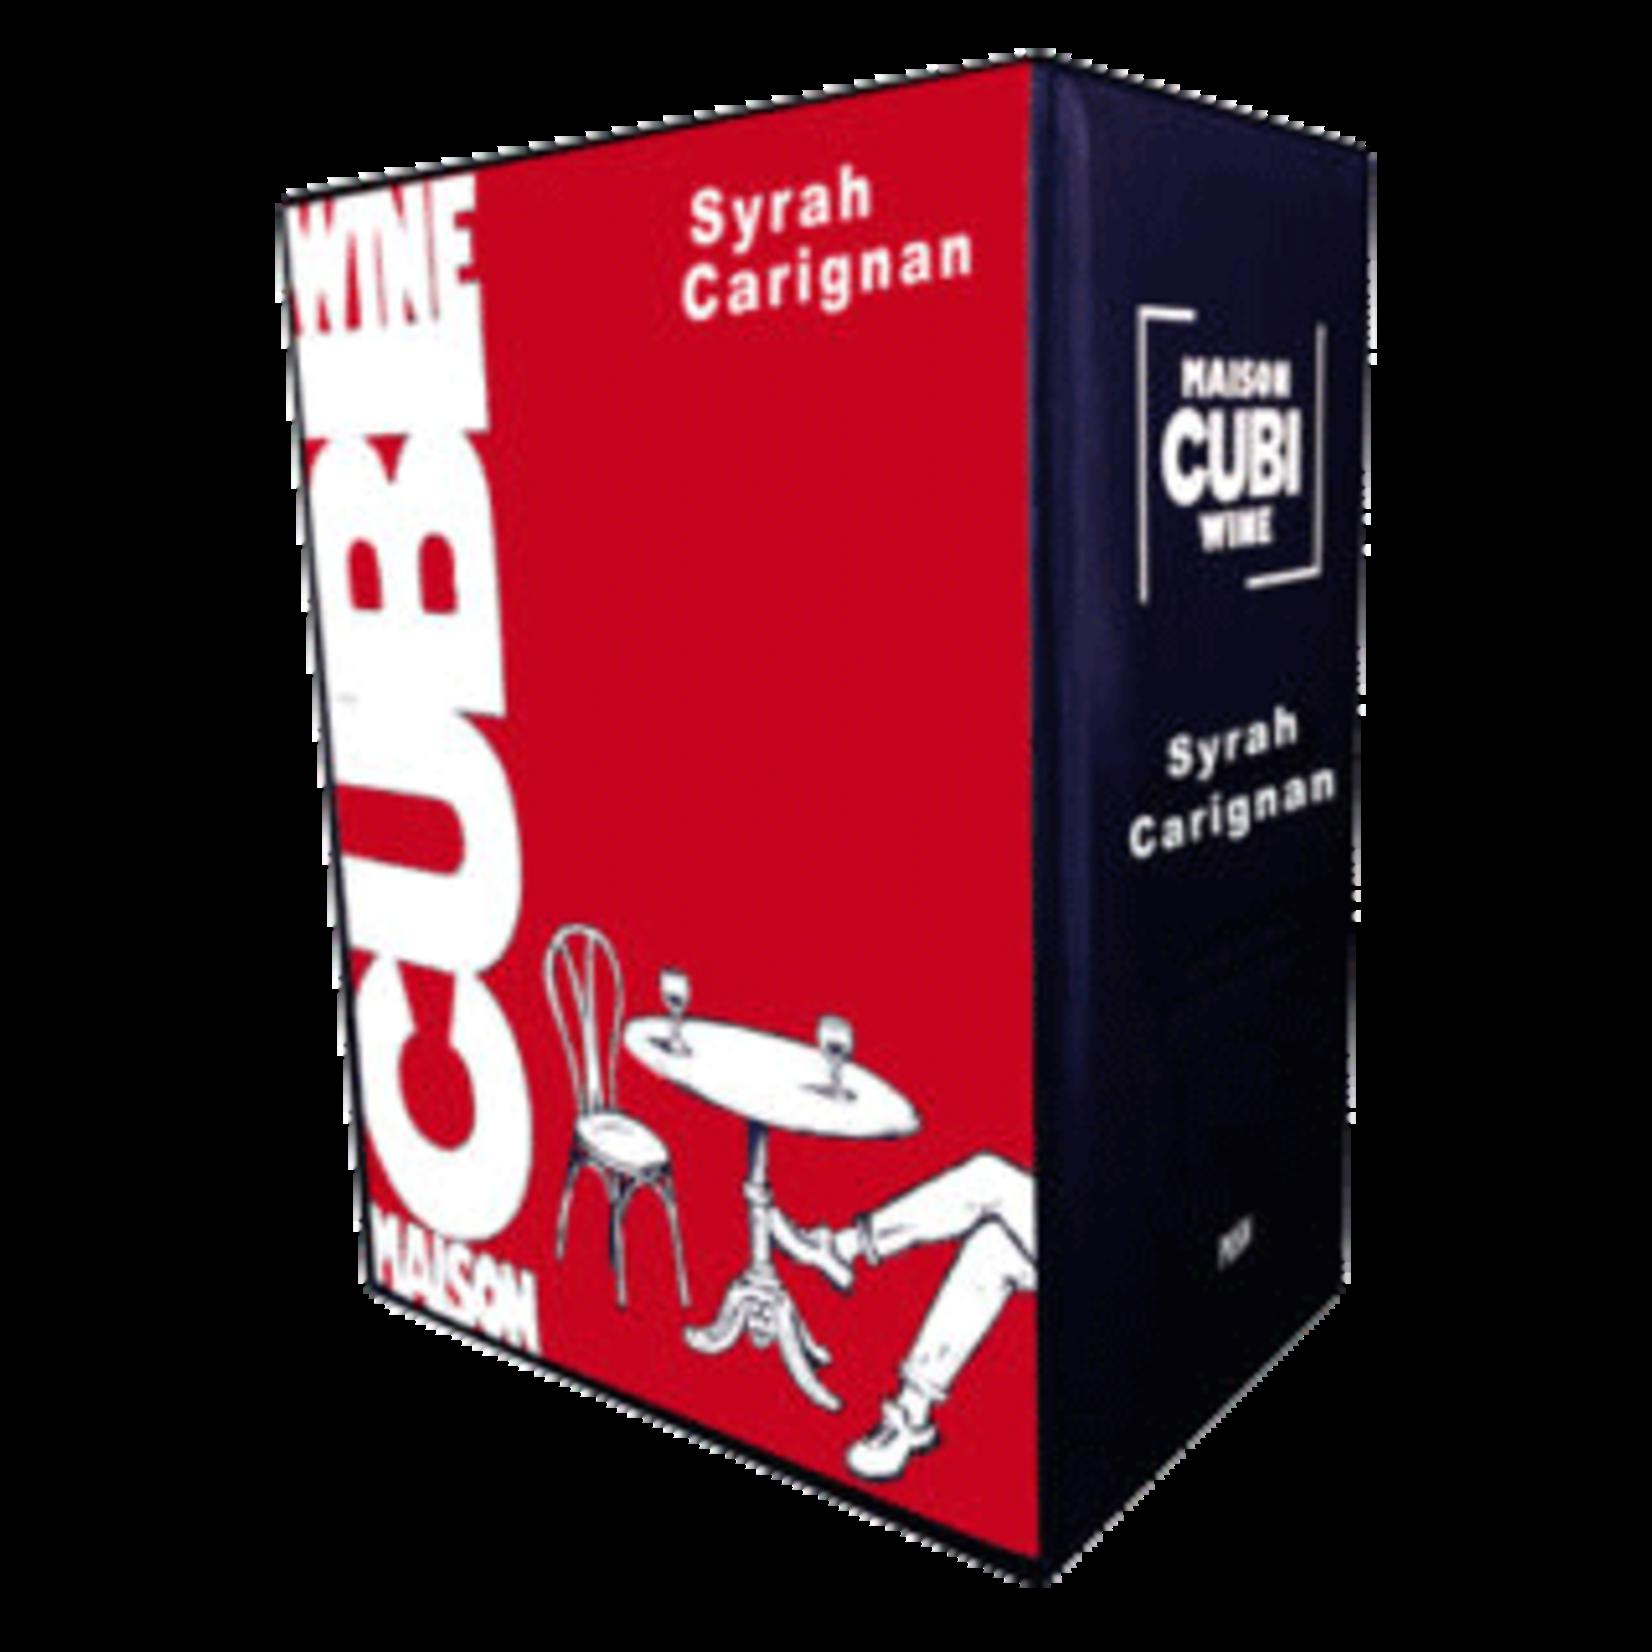 Maison Cubi Syrah Carignan 3L in a Box